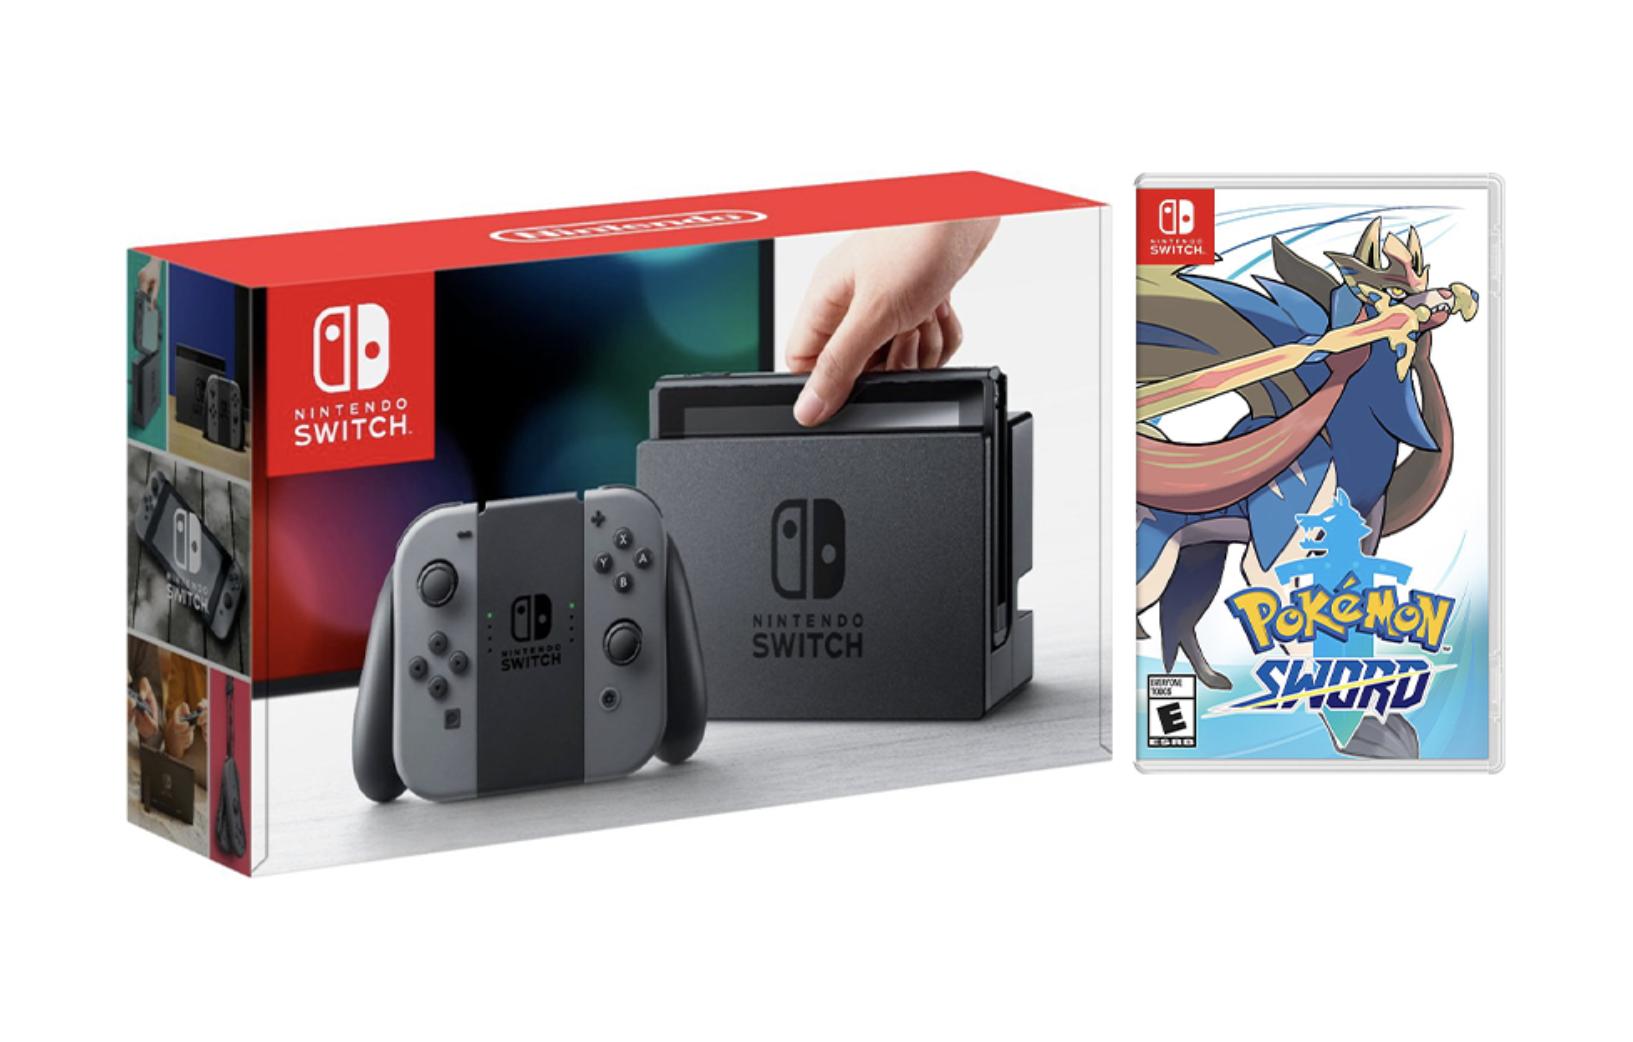 Nintendo Switch Gray Joy-Con Console Bundle with Pokémon Sword